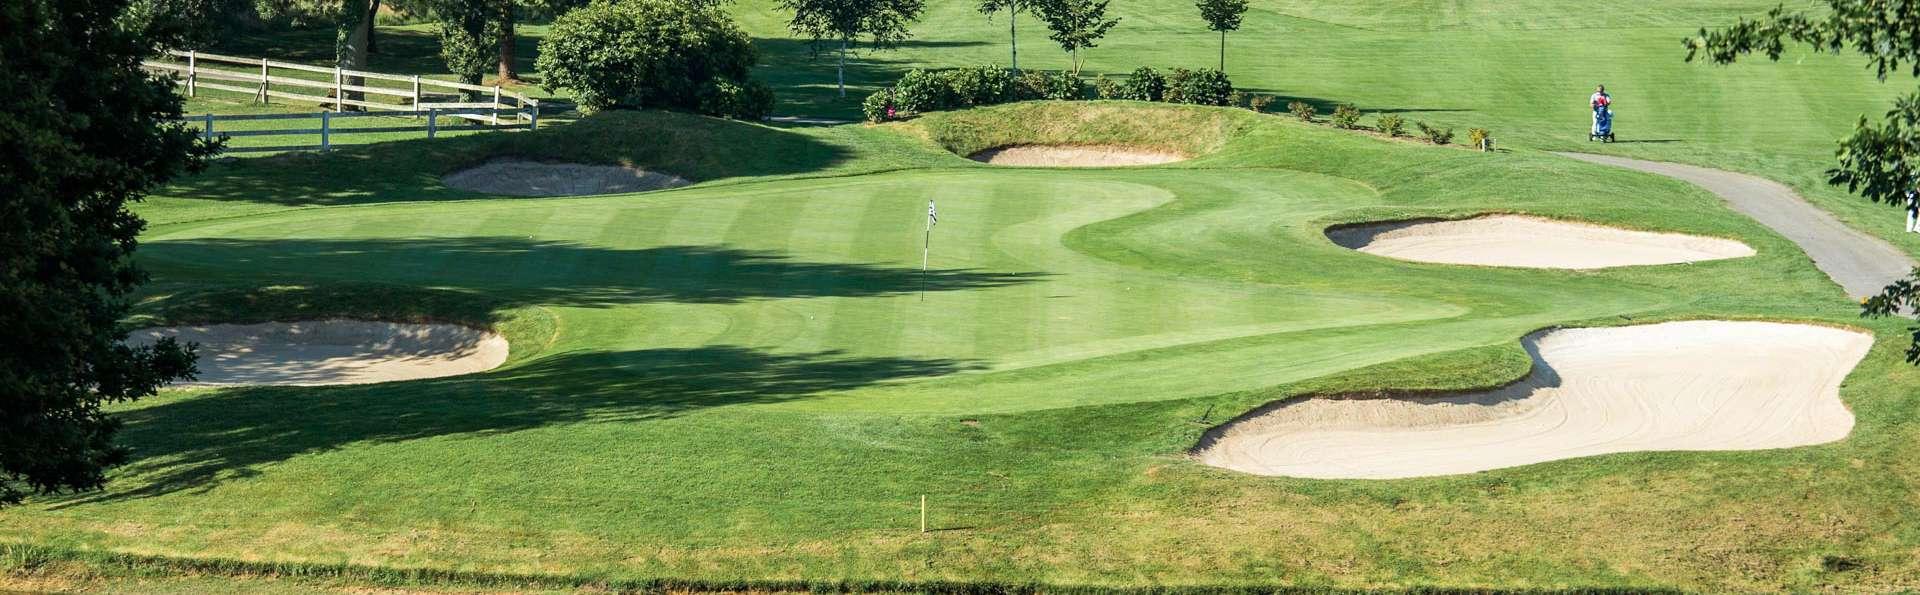 Saint-Malo Golf Resort - EDIT_N3_GOLF_01.jpg